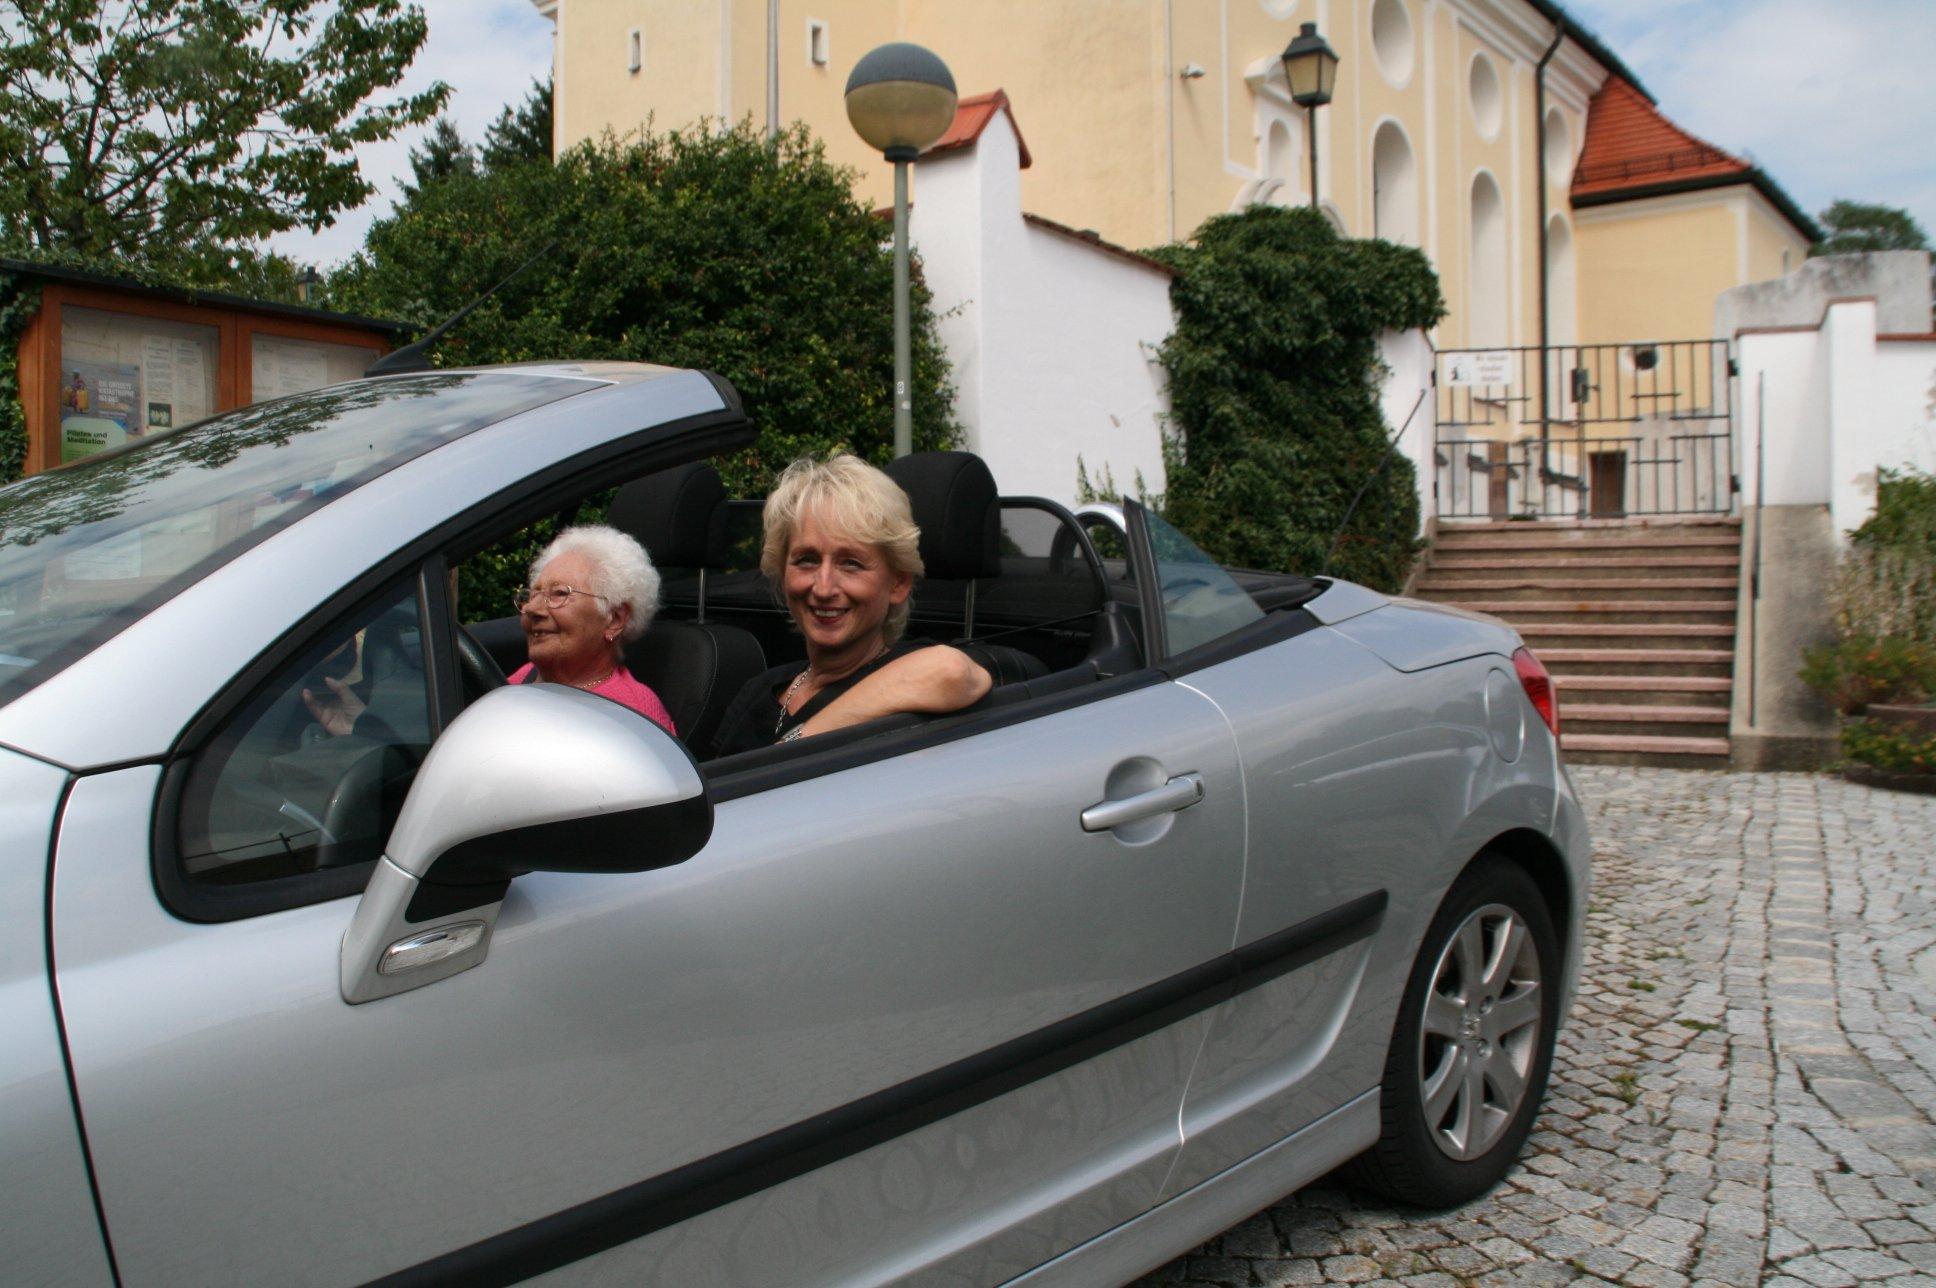 seniorenbetreuung-muenchen-lebensfreude-66-plus-cabrio-ausflug